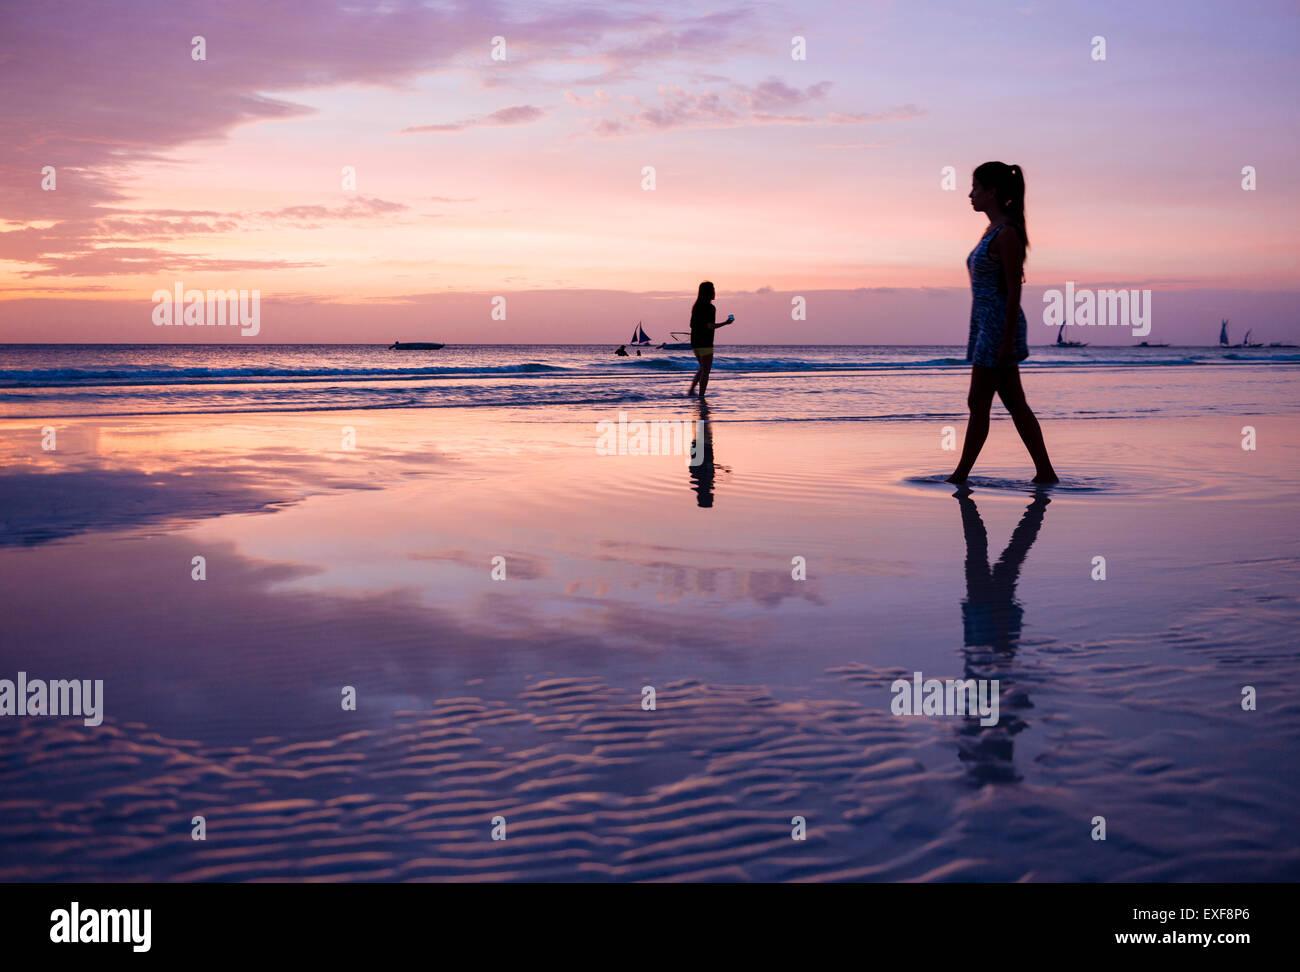 Silhouette junge Frau spazieren am Strand bei Sonnenuntergang, Insel Boracay, Visayas, Philippinen Stockbild